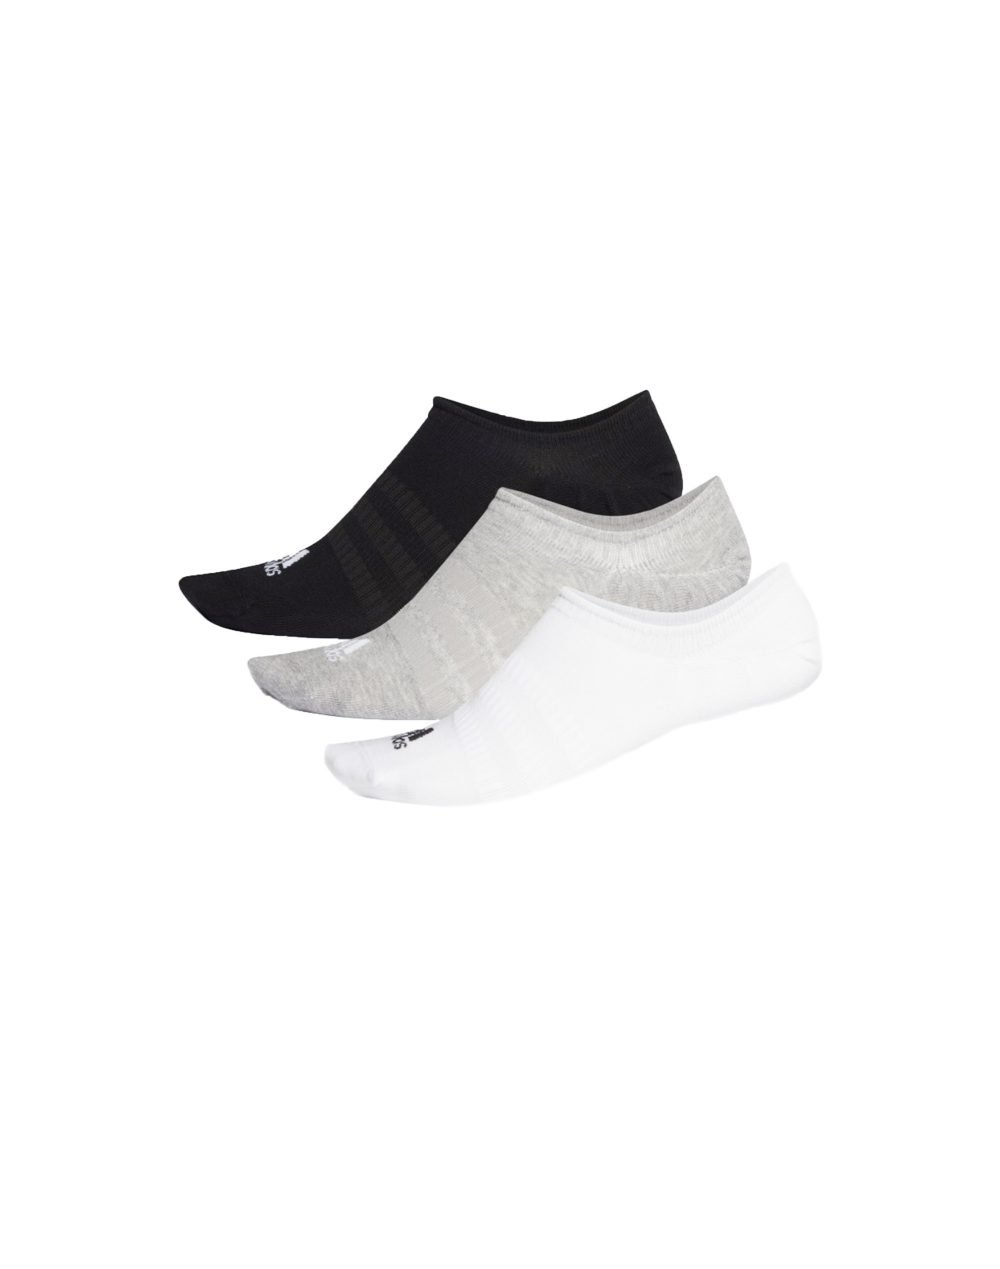 Adidas Light Nosh3PP Sock (DZ9414) White/Grey/Black